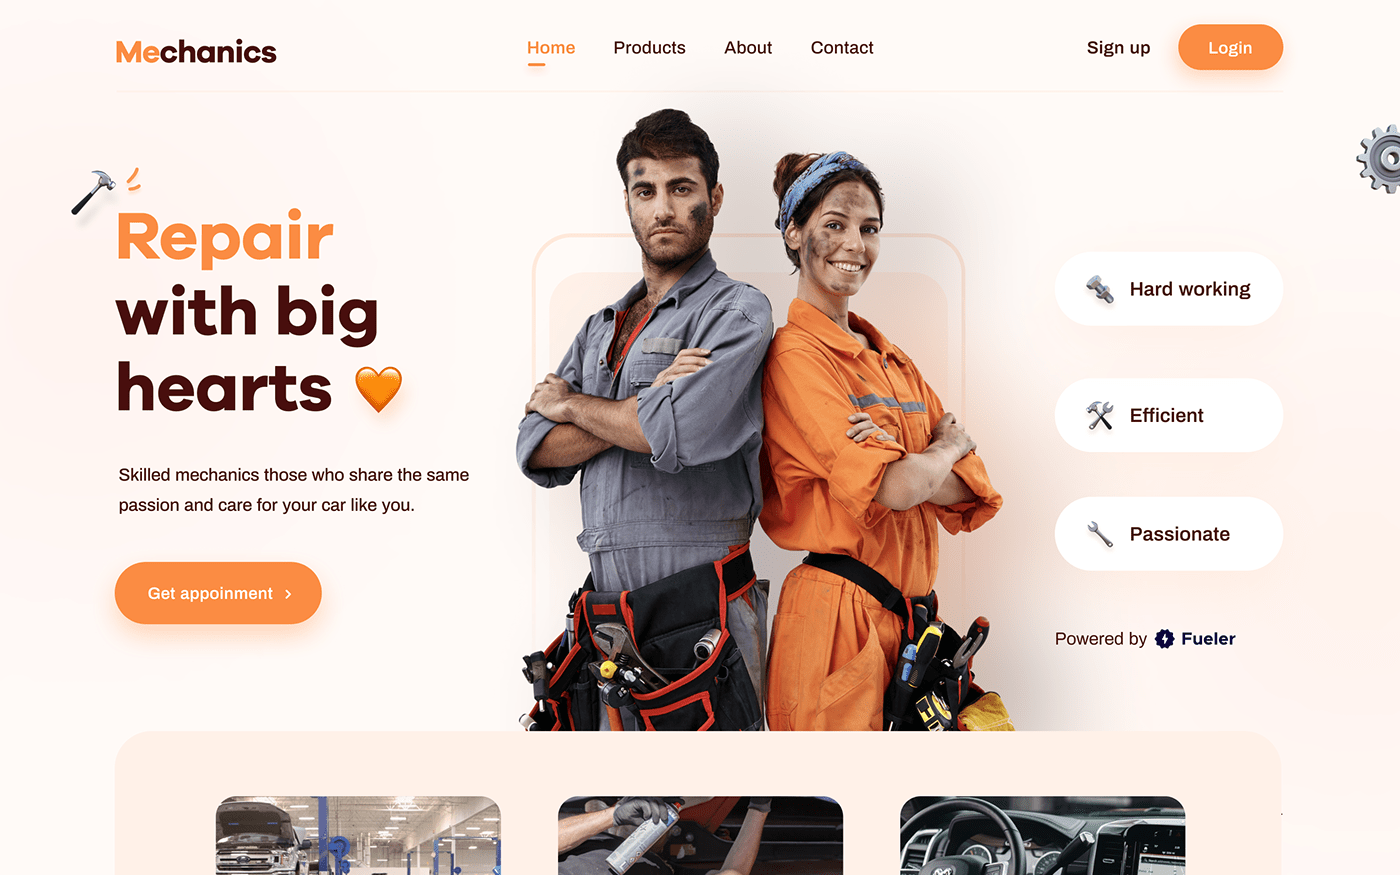 design landing page mechanics presentation ui design UI/UX UX design Web Design  Website wireframe